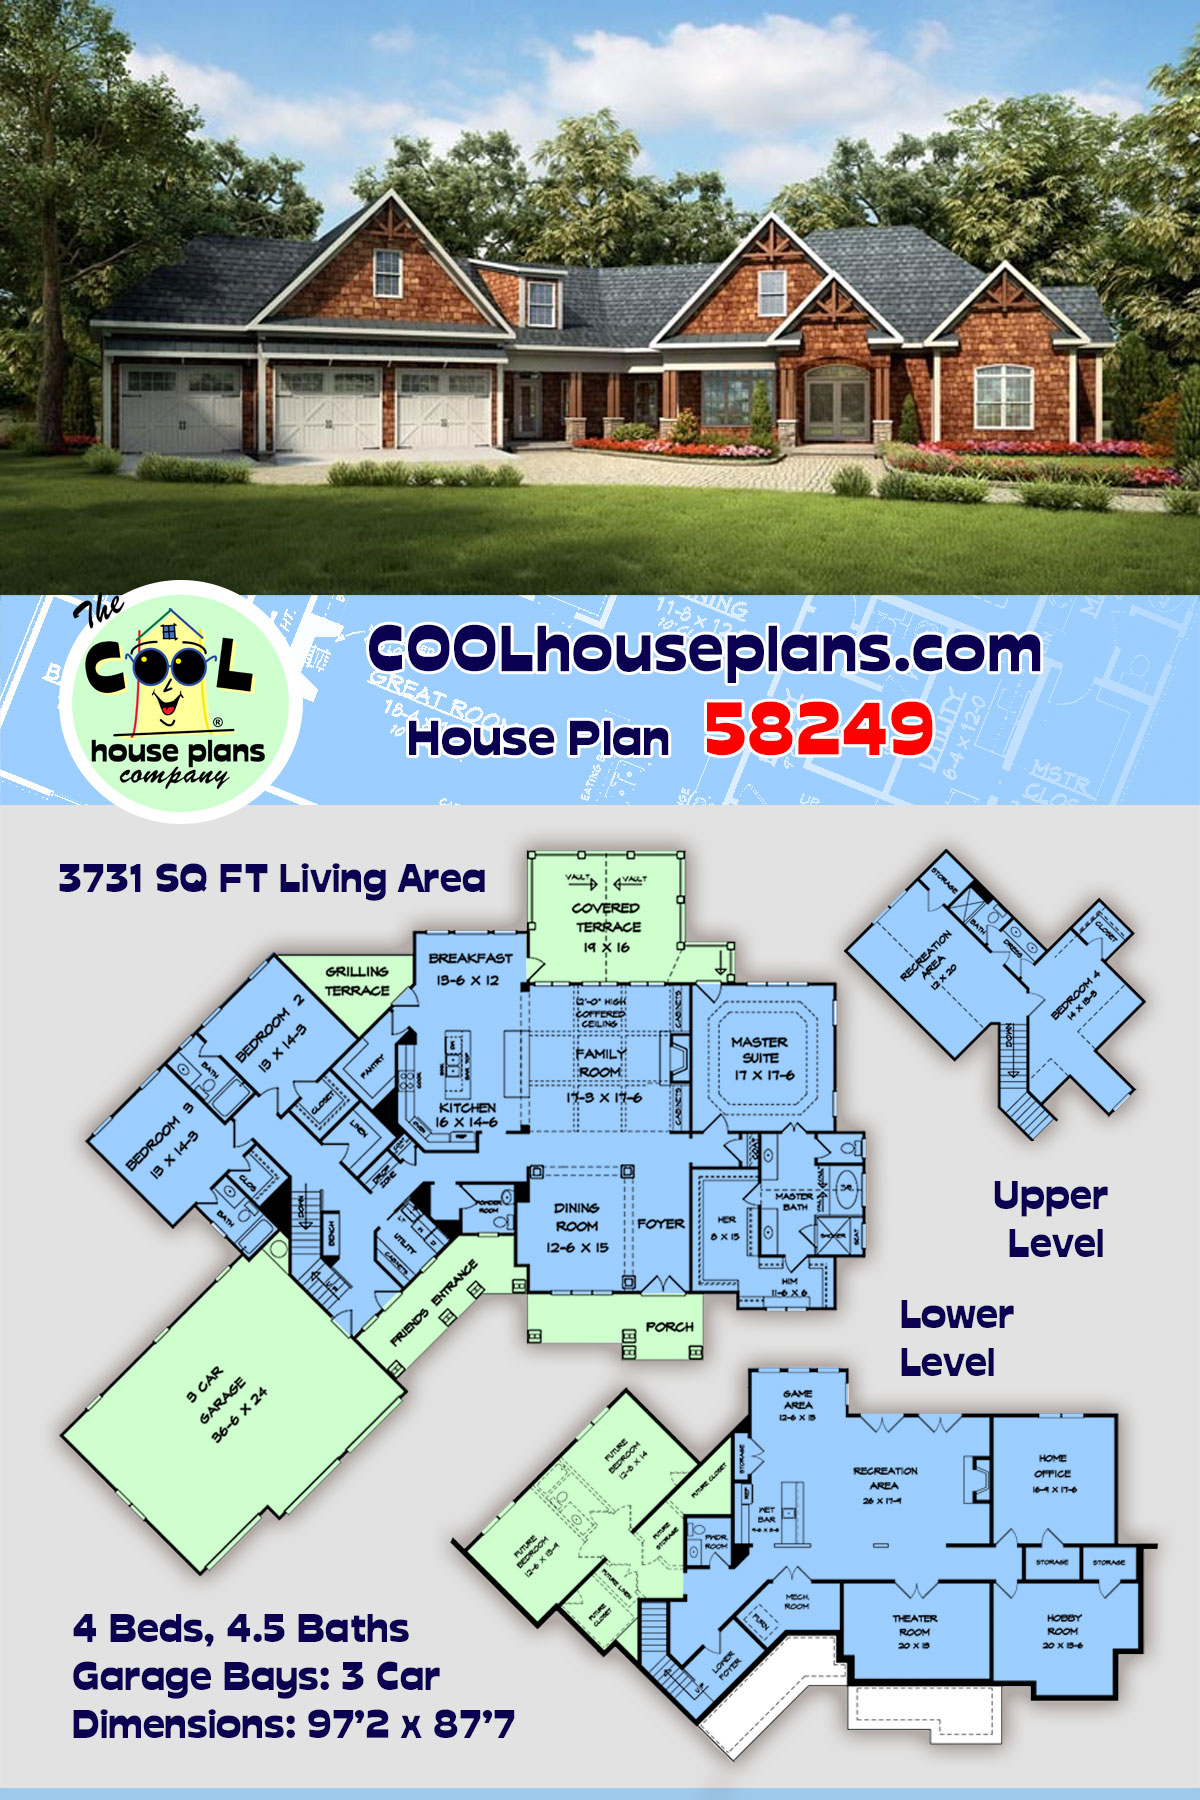 Craftsman, Historic House Plan 58249 with 4 Beds, 5 Baths, 3 Car Garage